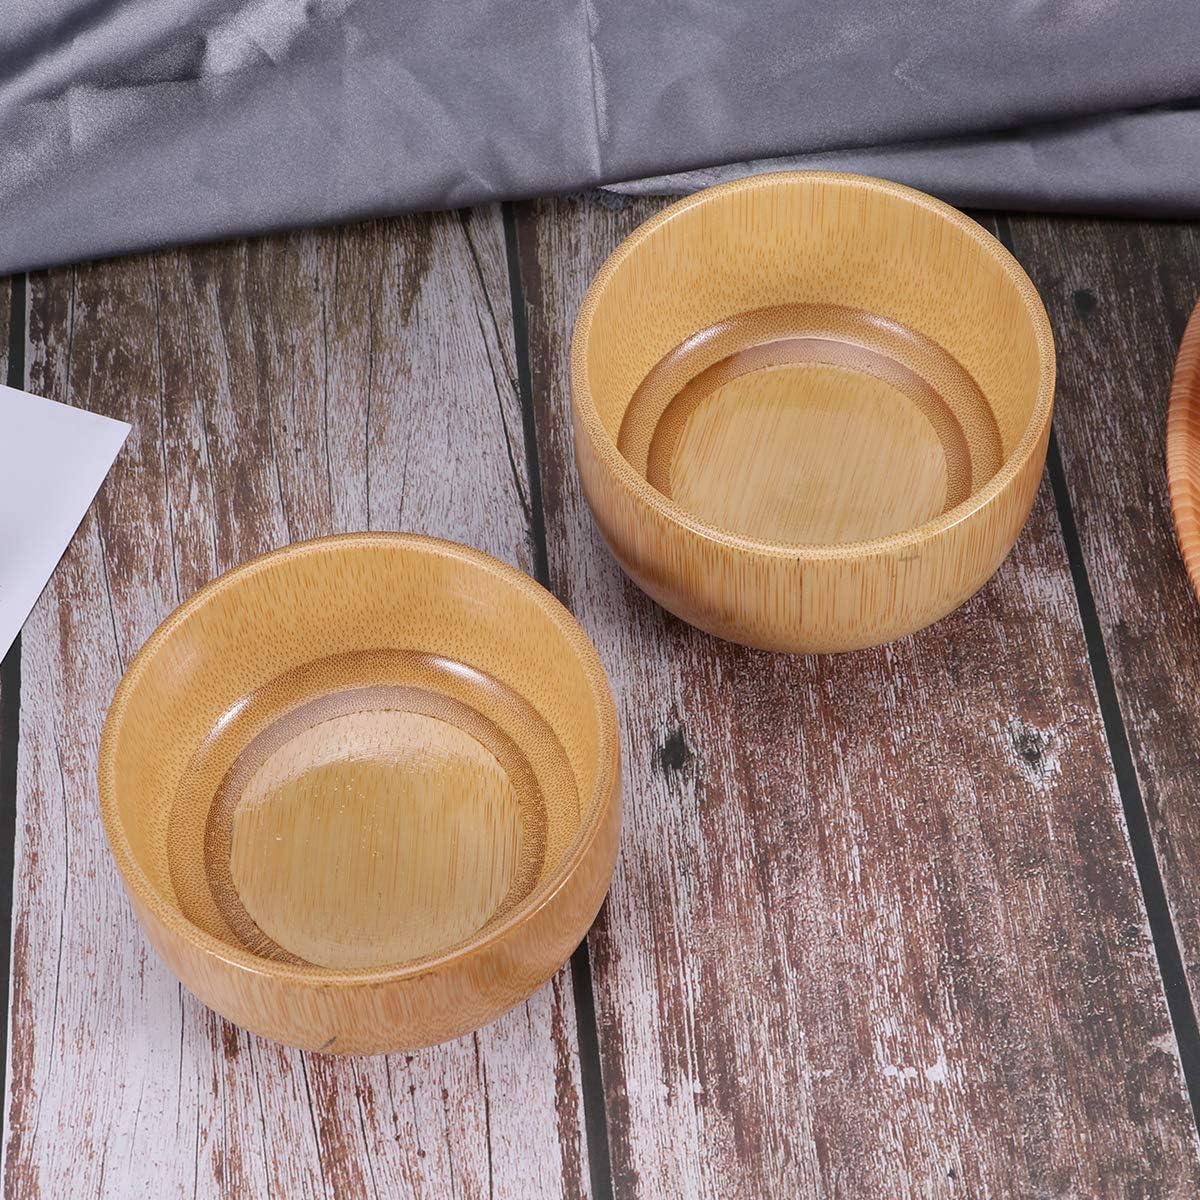 Hemoton 2 Piezas Cuencos de bamb/ú carbonizado Natural antimoho taz/ón de Servir de Comida de bamb/ú Resistente al Calor taz/ón de Ensalada antica/ída para Alimentos de Frutas